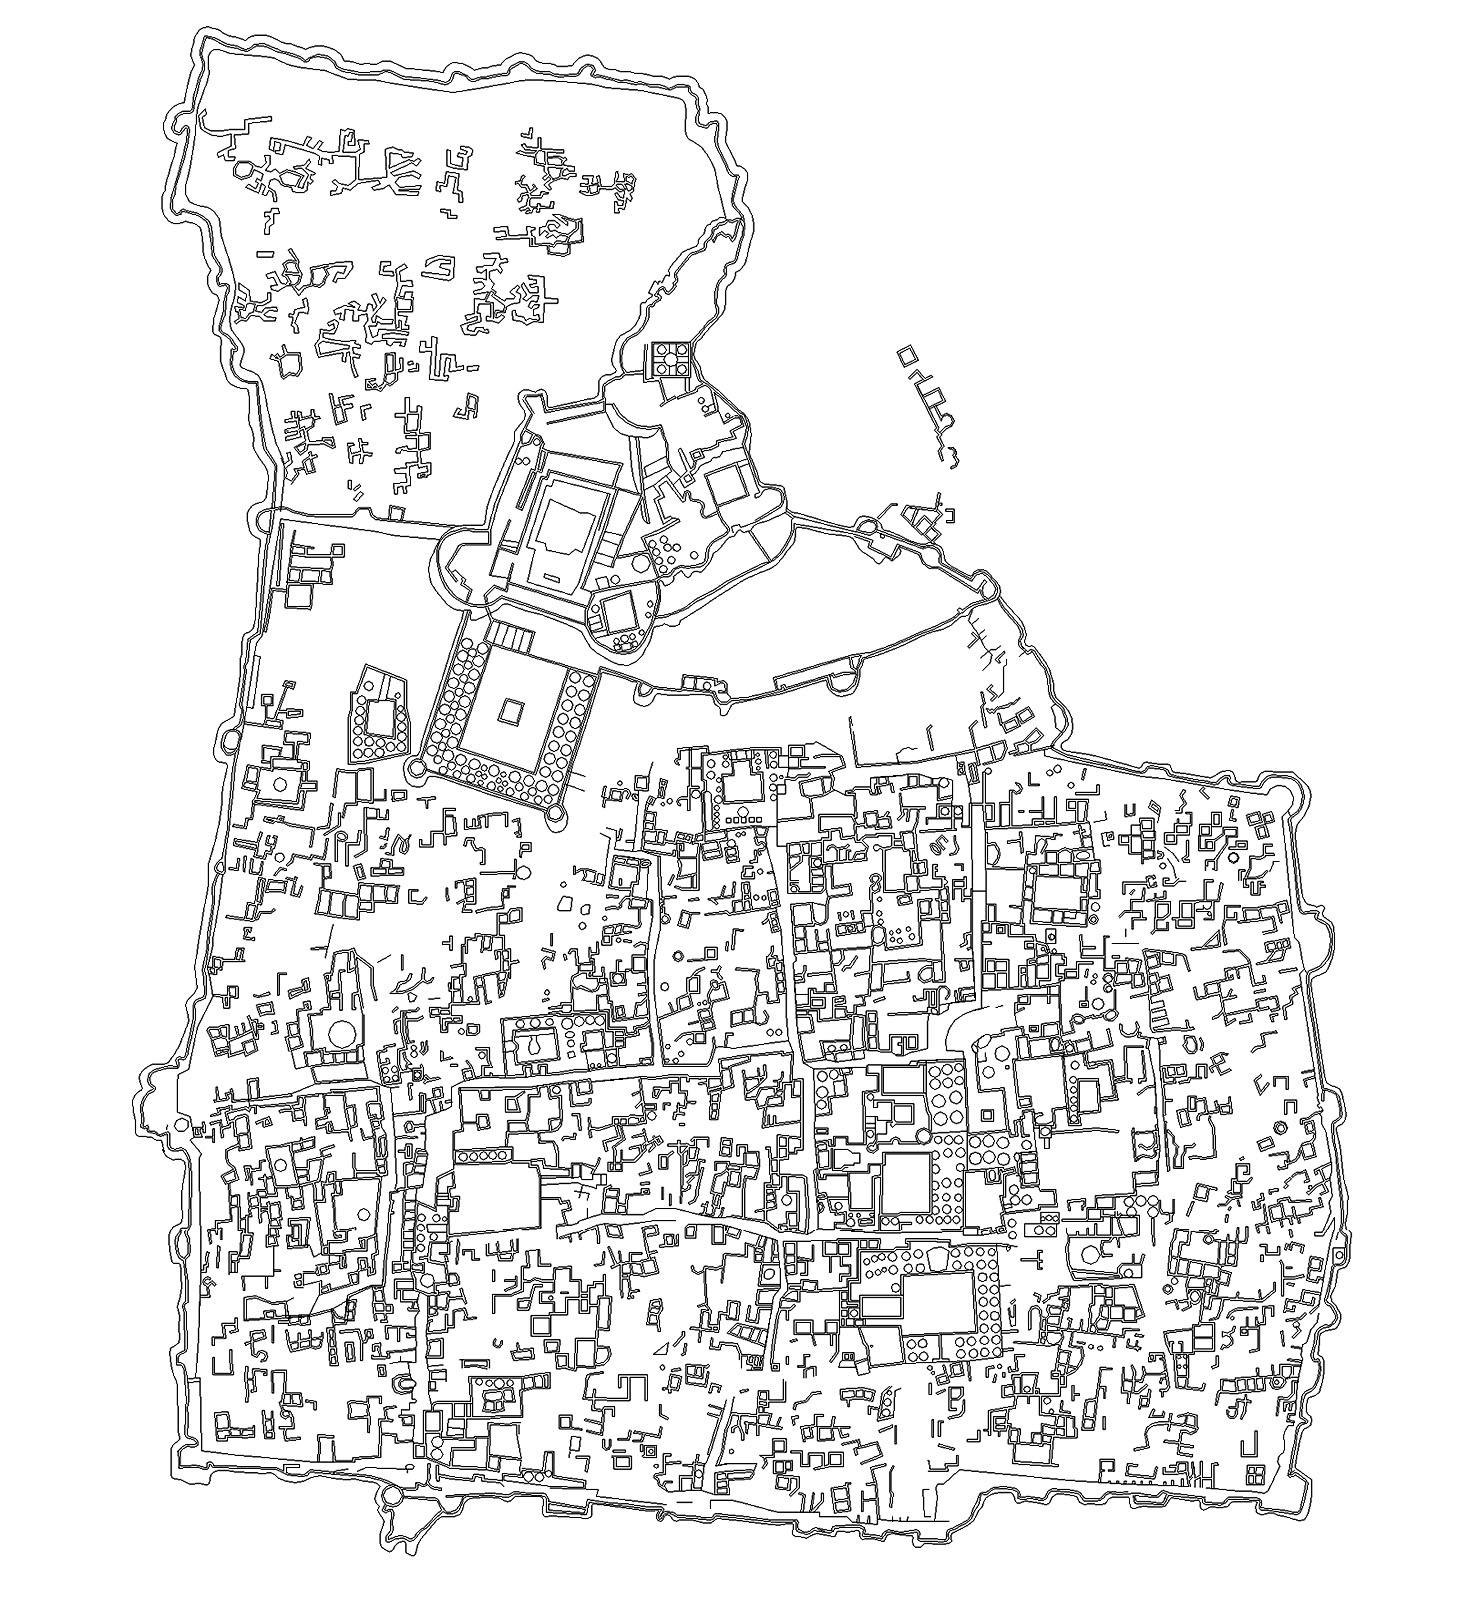 danielvillalobos-architecturalexhibition-bam-architectureofmud-64